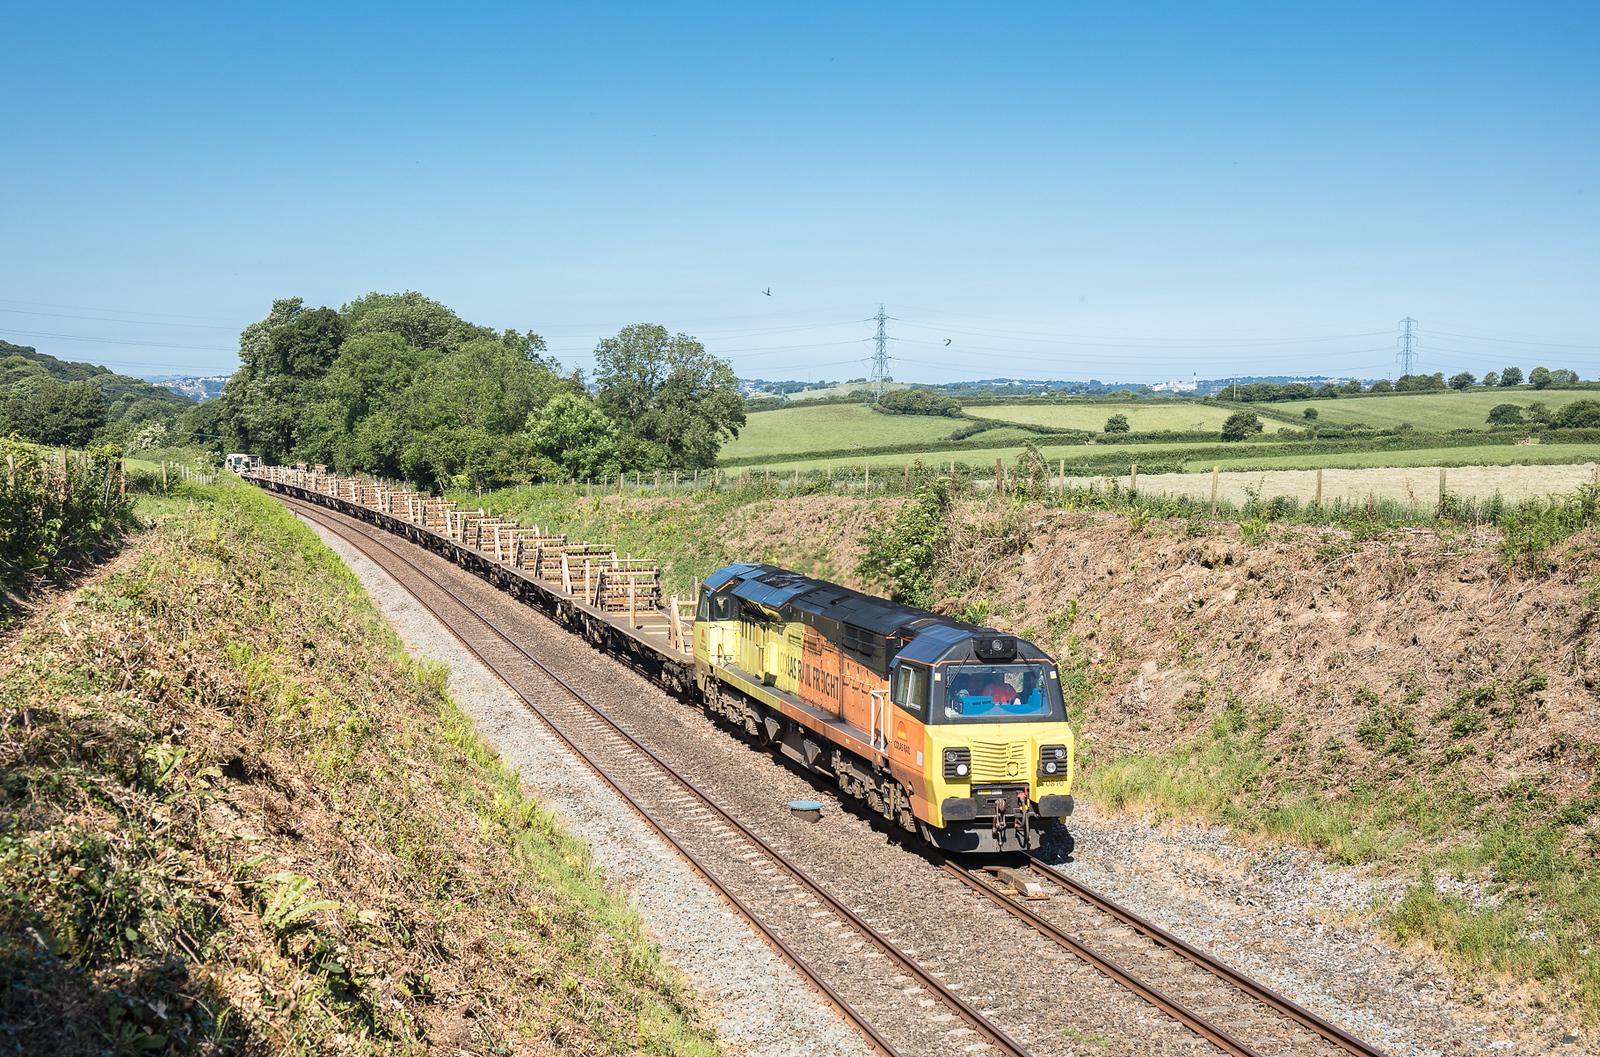 180617  70810 nears Hemerdon summit with the  6C97 09:10 Saltash to Westbury